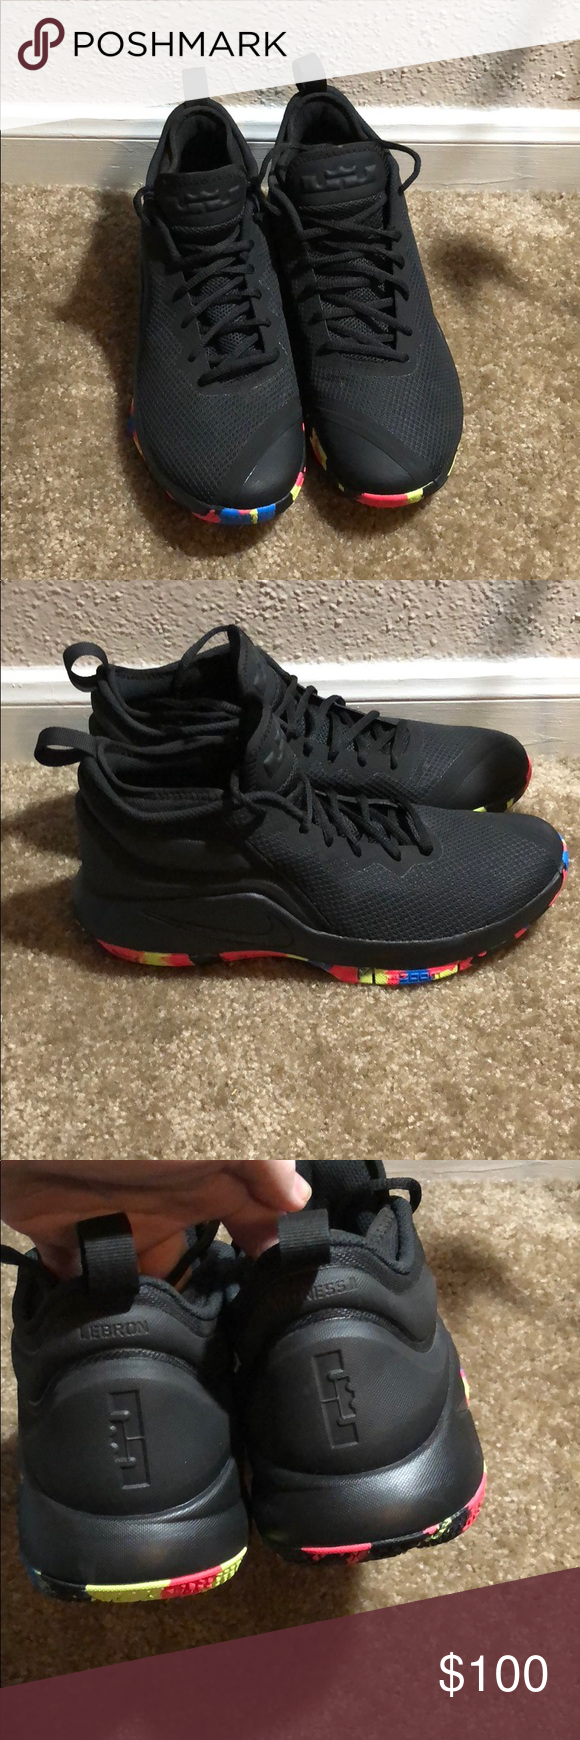 Lebron James Nike | Black nike shoes